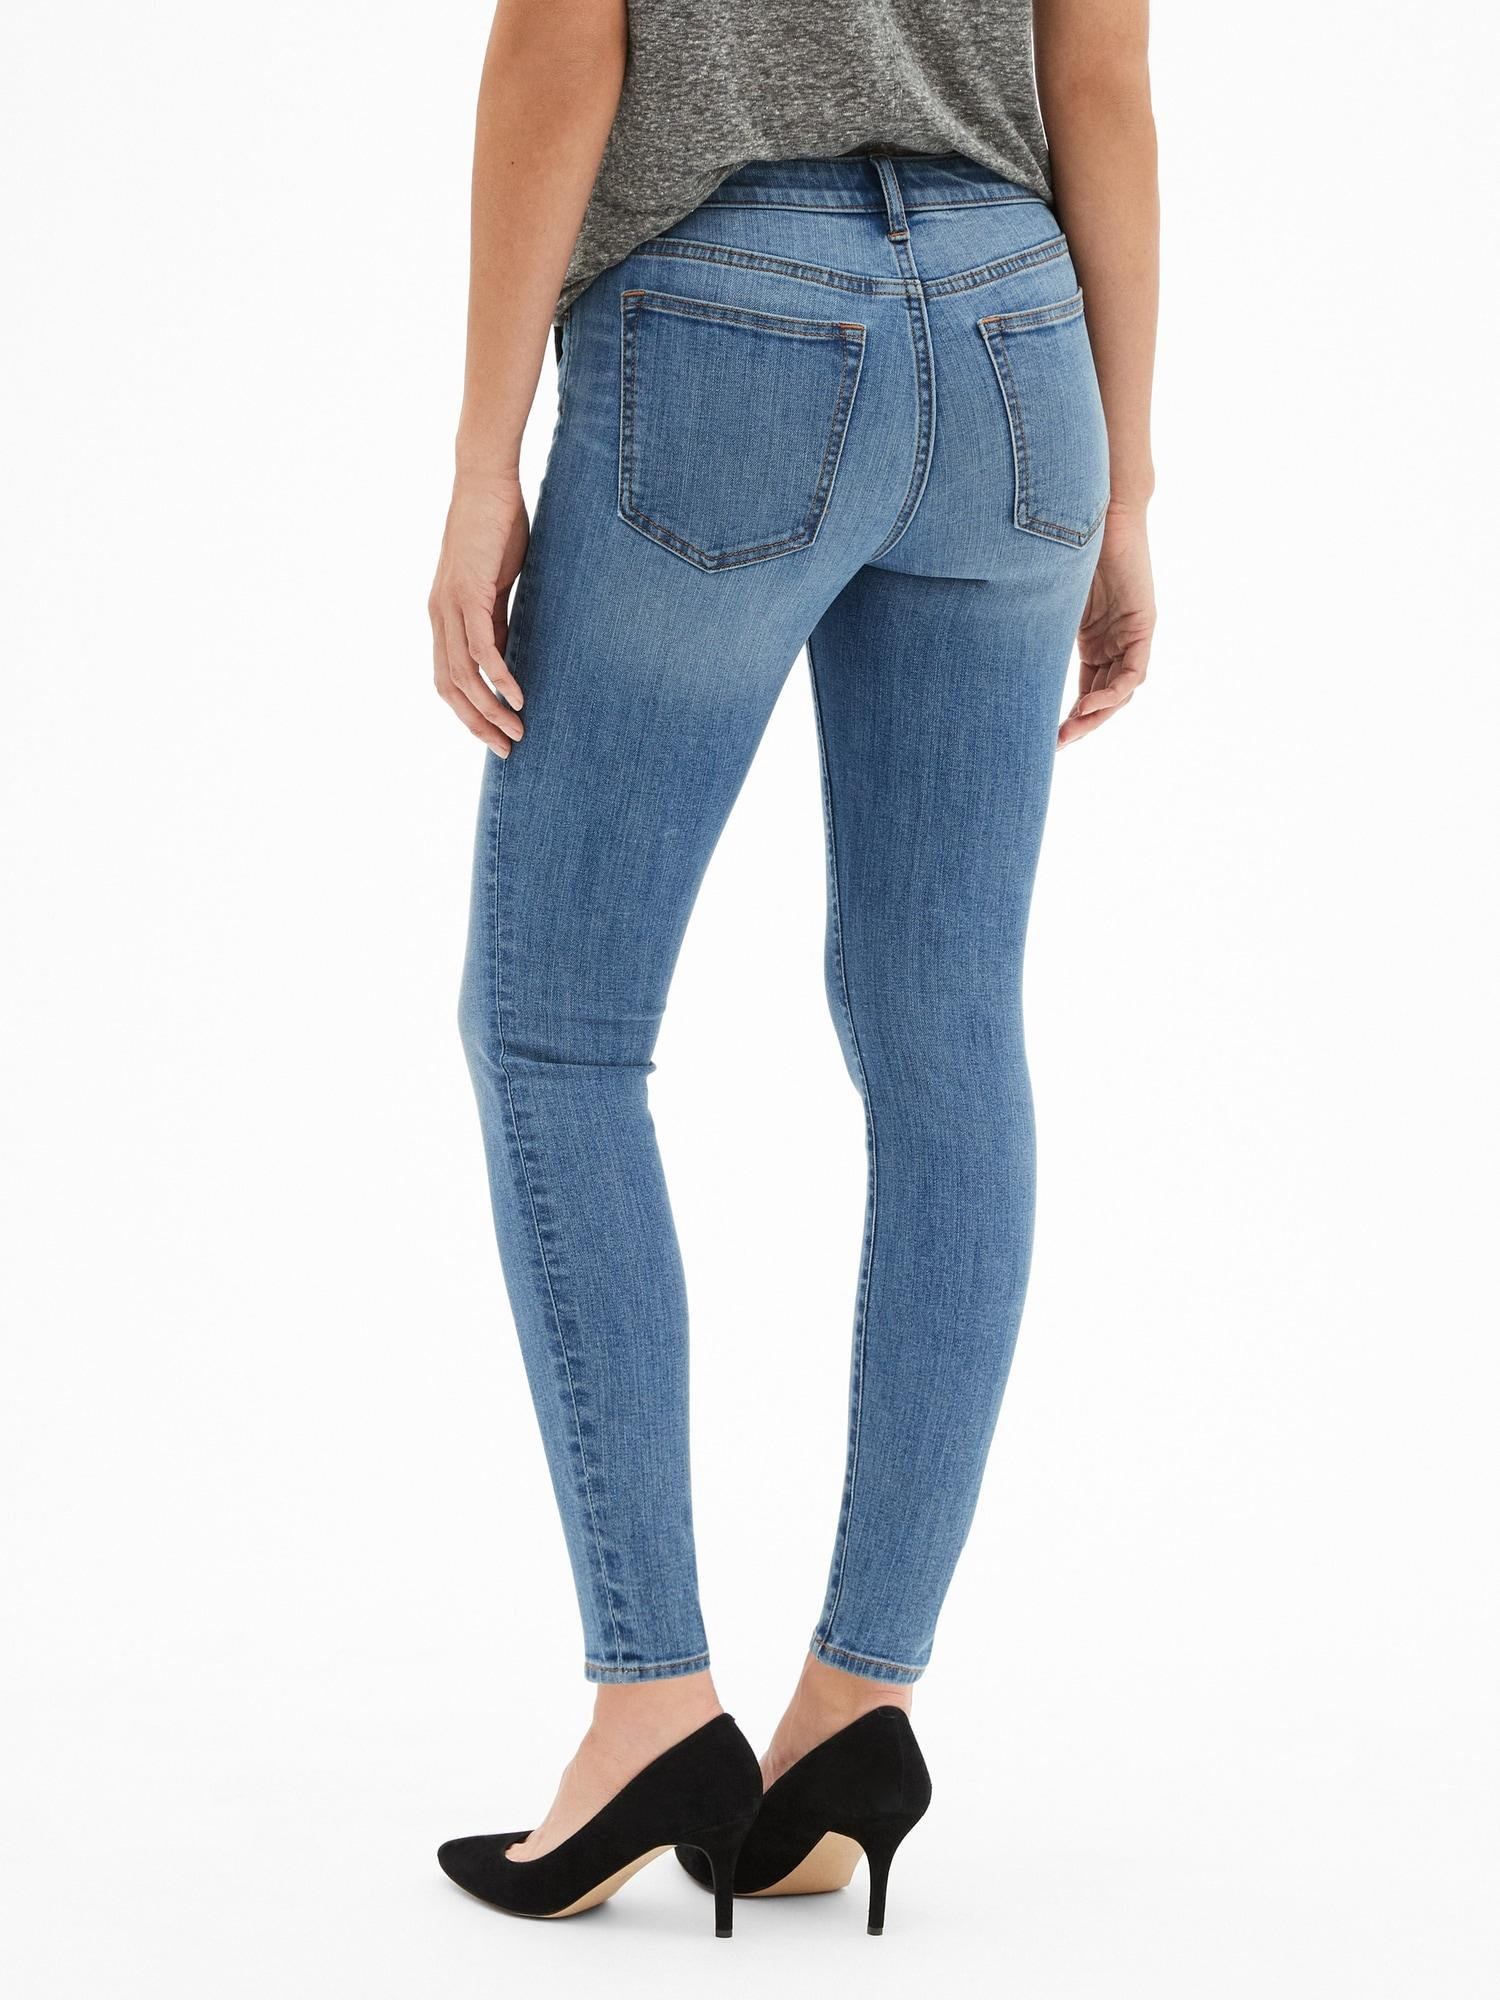 9d2a77712b292 Lyst - GAP Factory Mid Rise Legging Skimmer Jeans in Blue